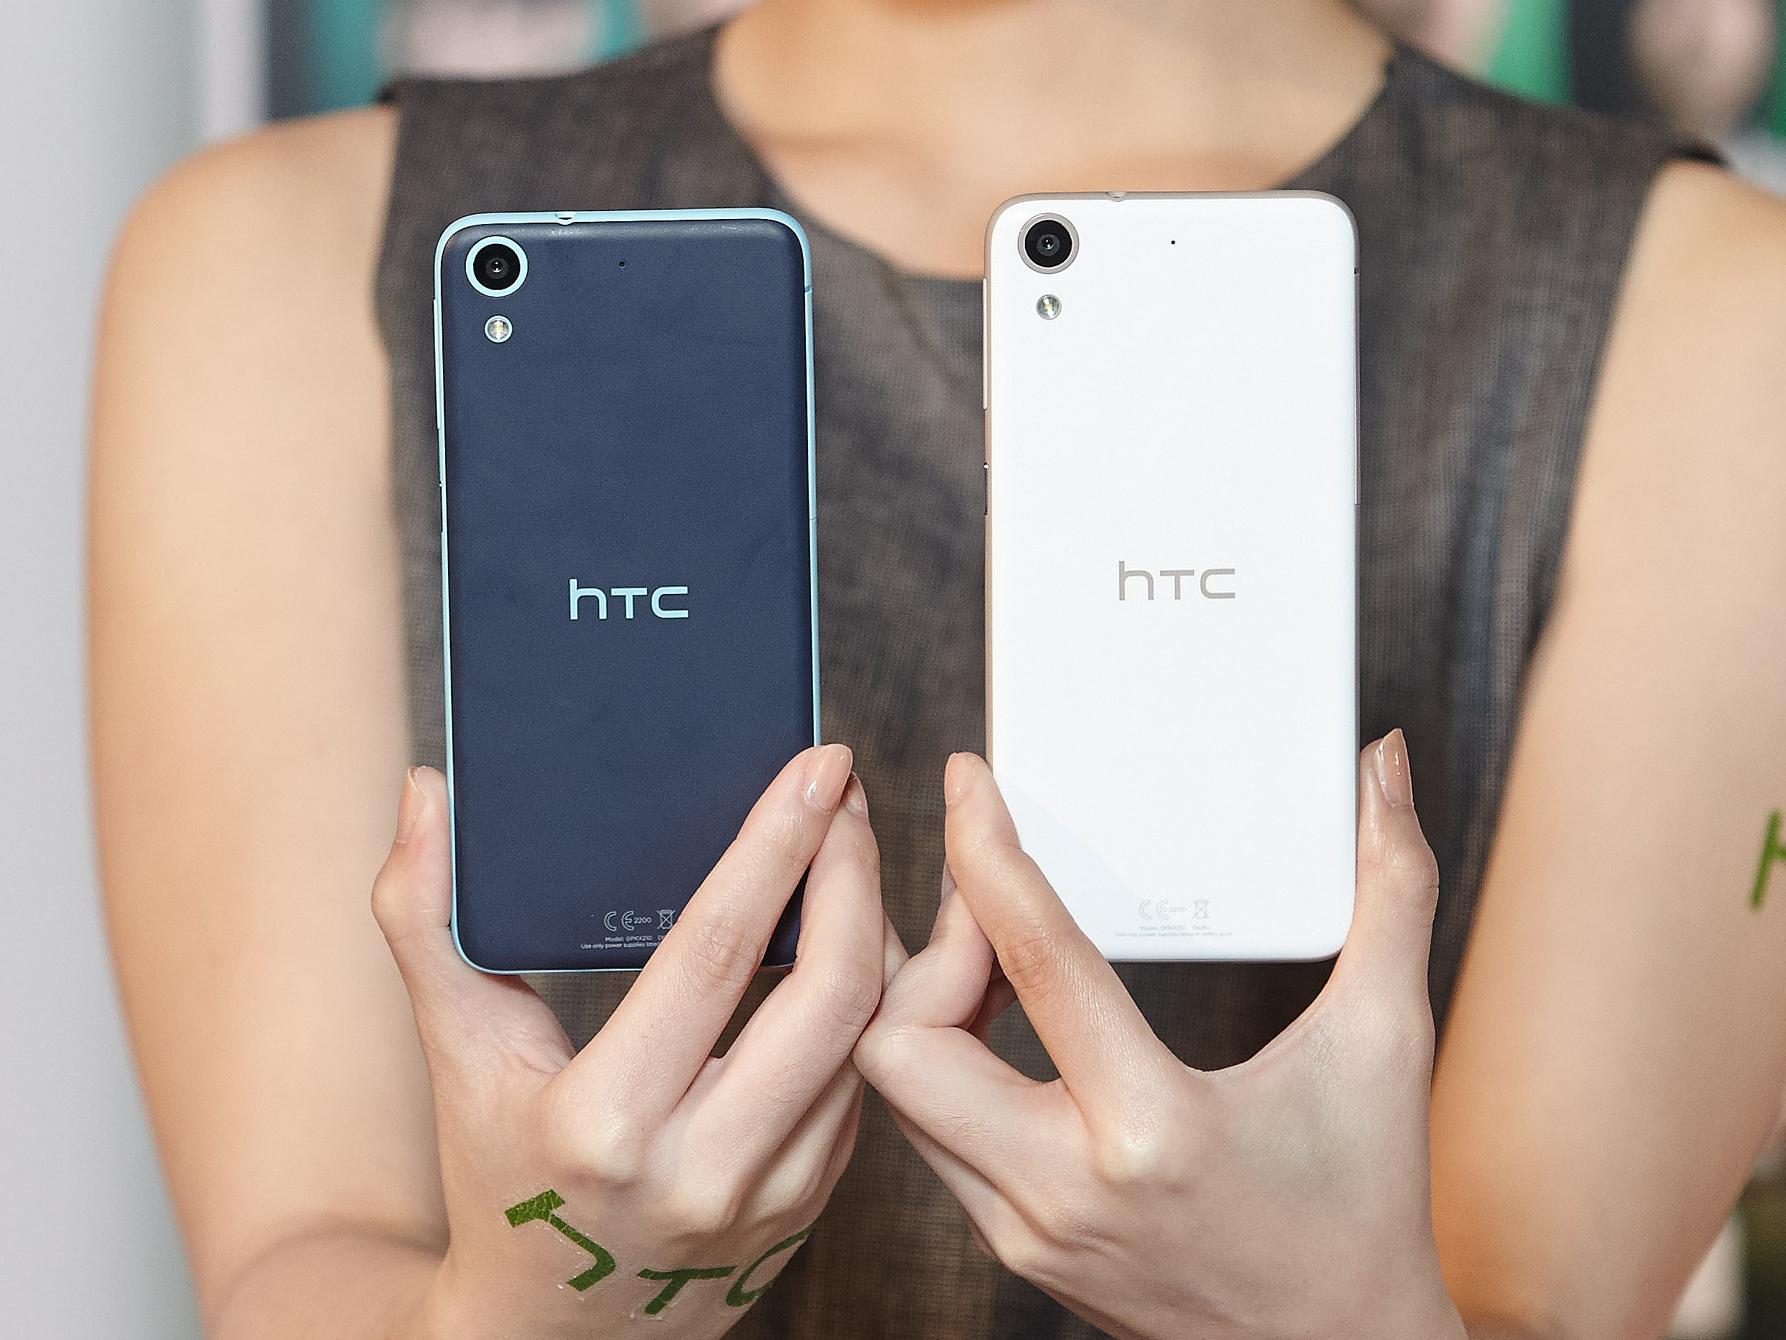 HTC Desire 626 超值入門機發表,4G LTE 全頻售價 5,990 元